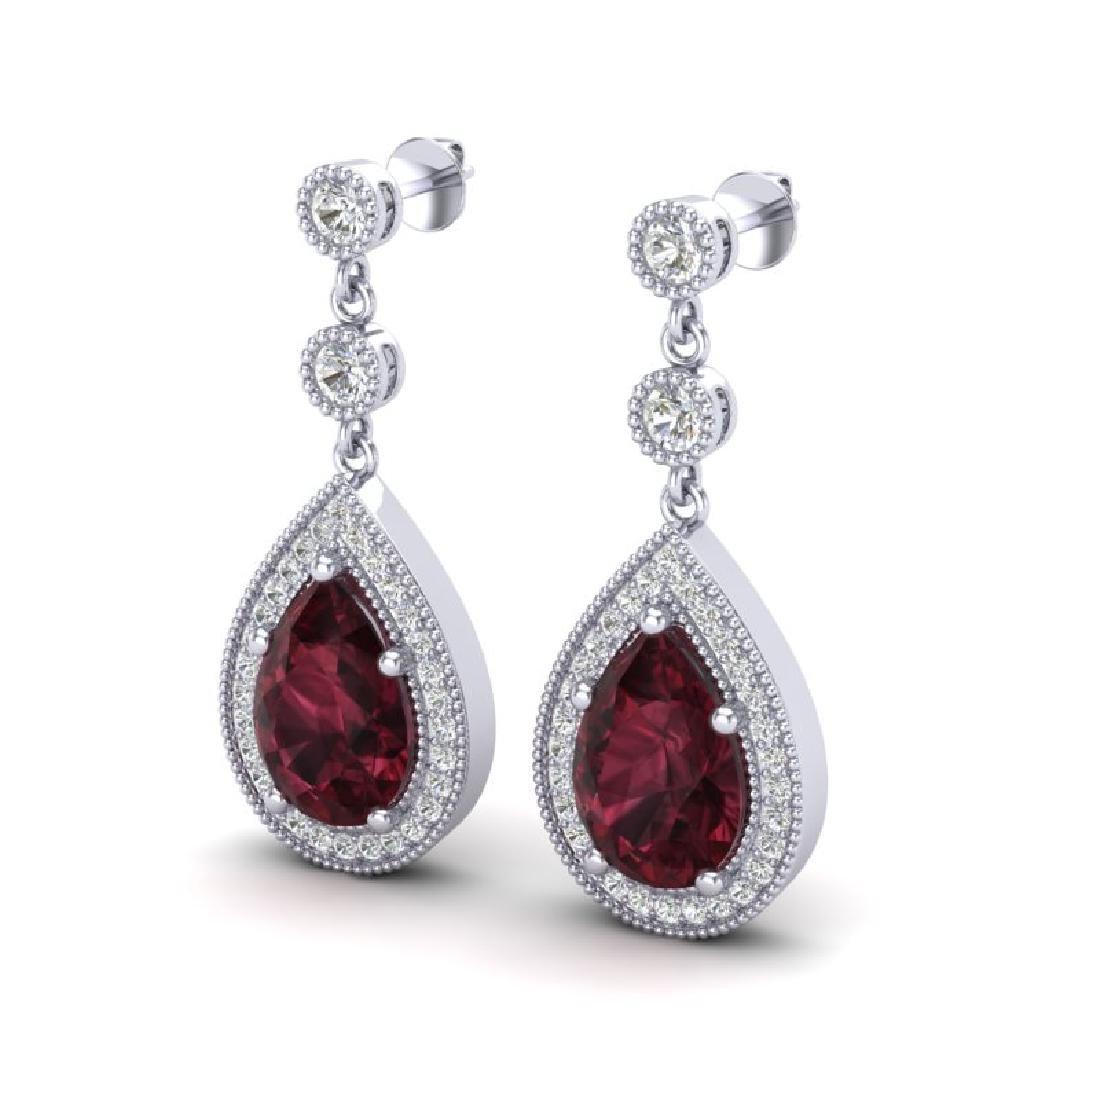 4.50 CTW Garnet & Micro Pave VS/SI Diamond Earrings